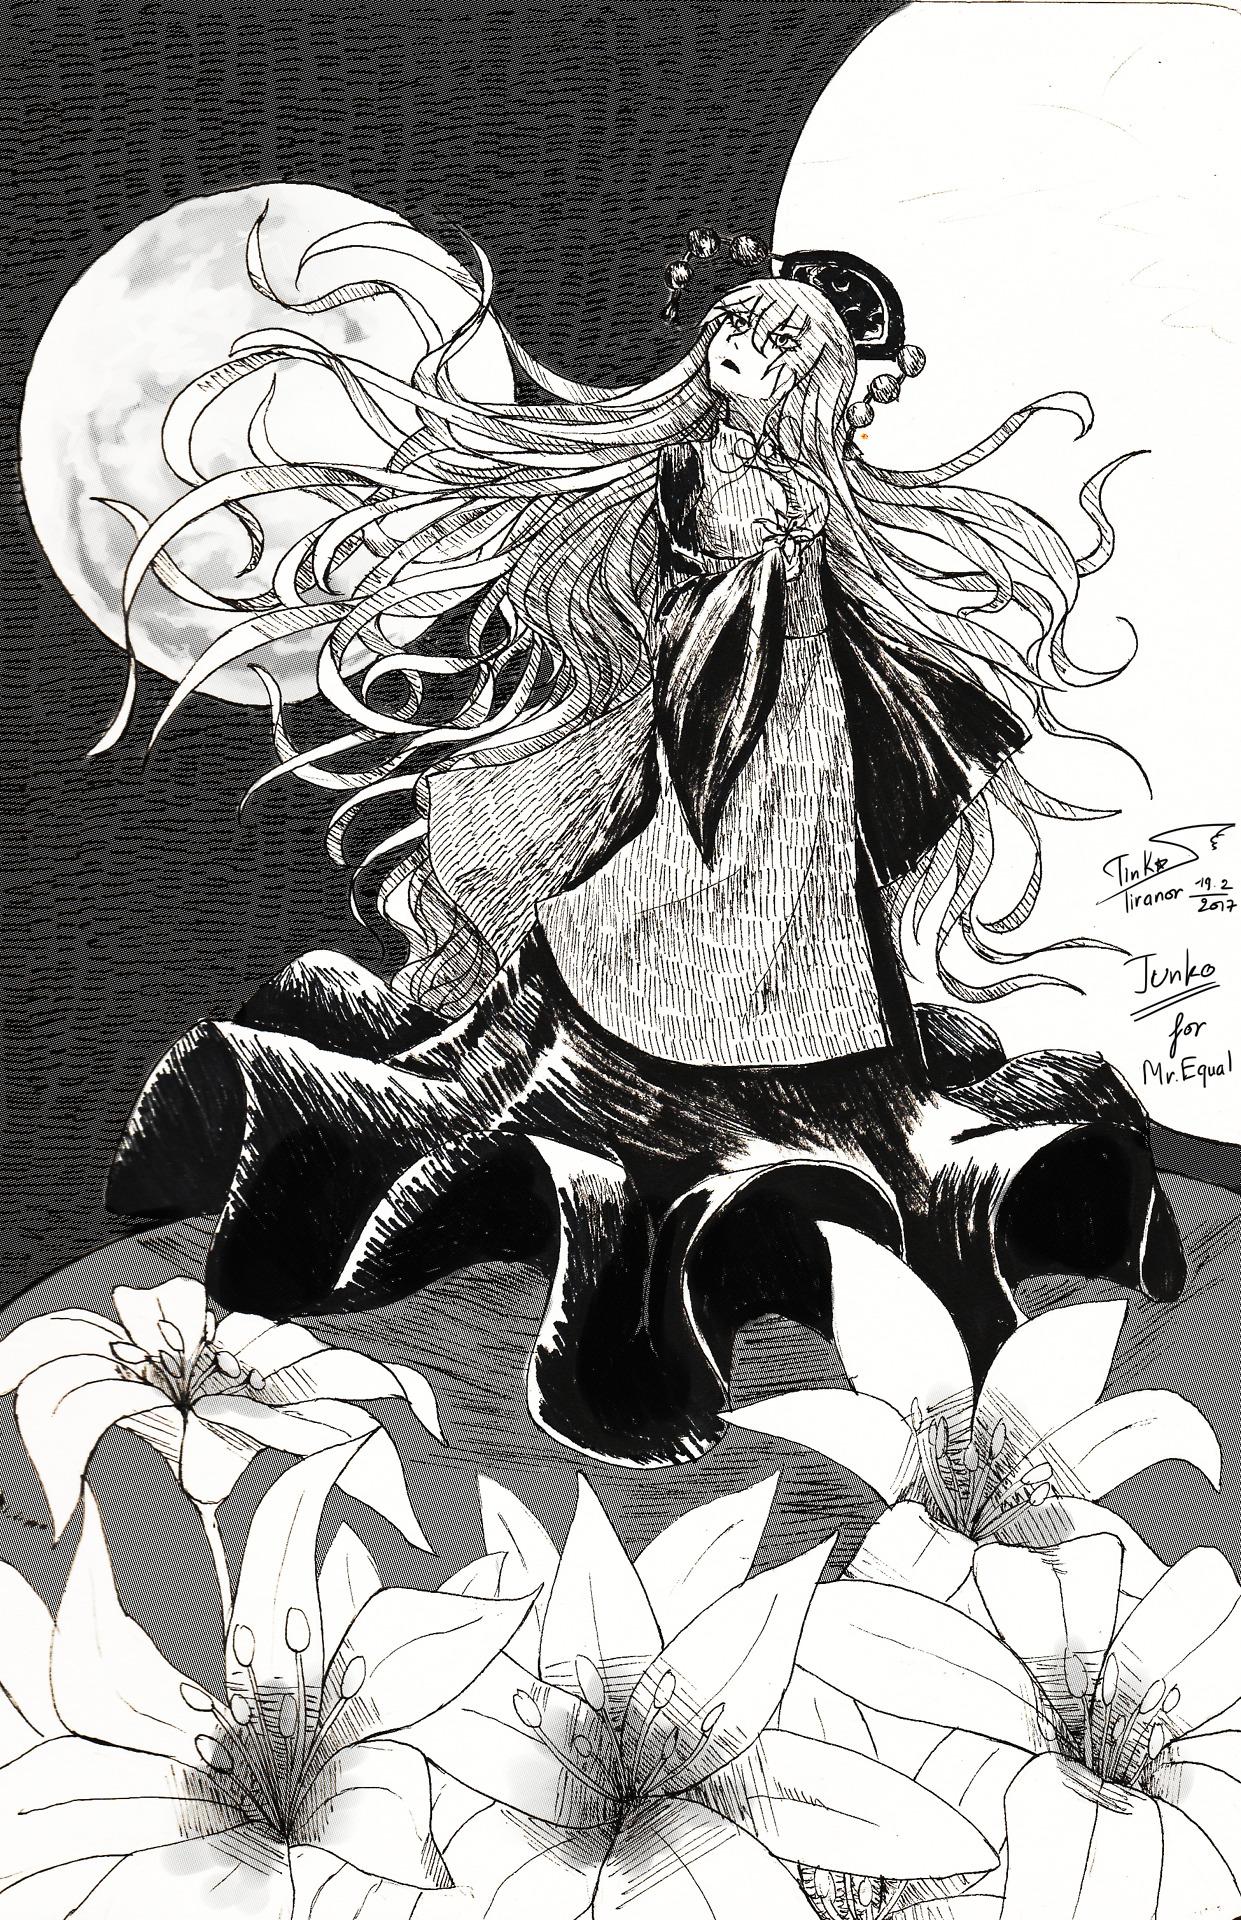 [Gallery] Tankihou: Ổ Dơi - Page 10 Tumblr_olnznsdTge1vd0m40o1_1280